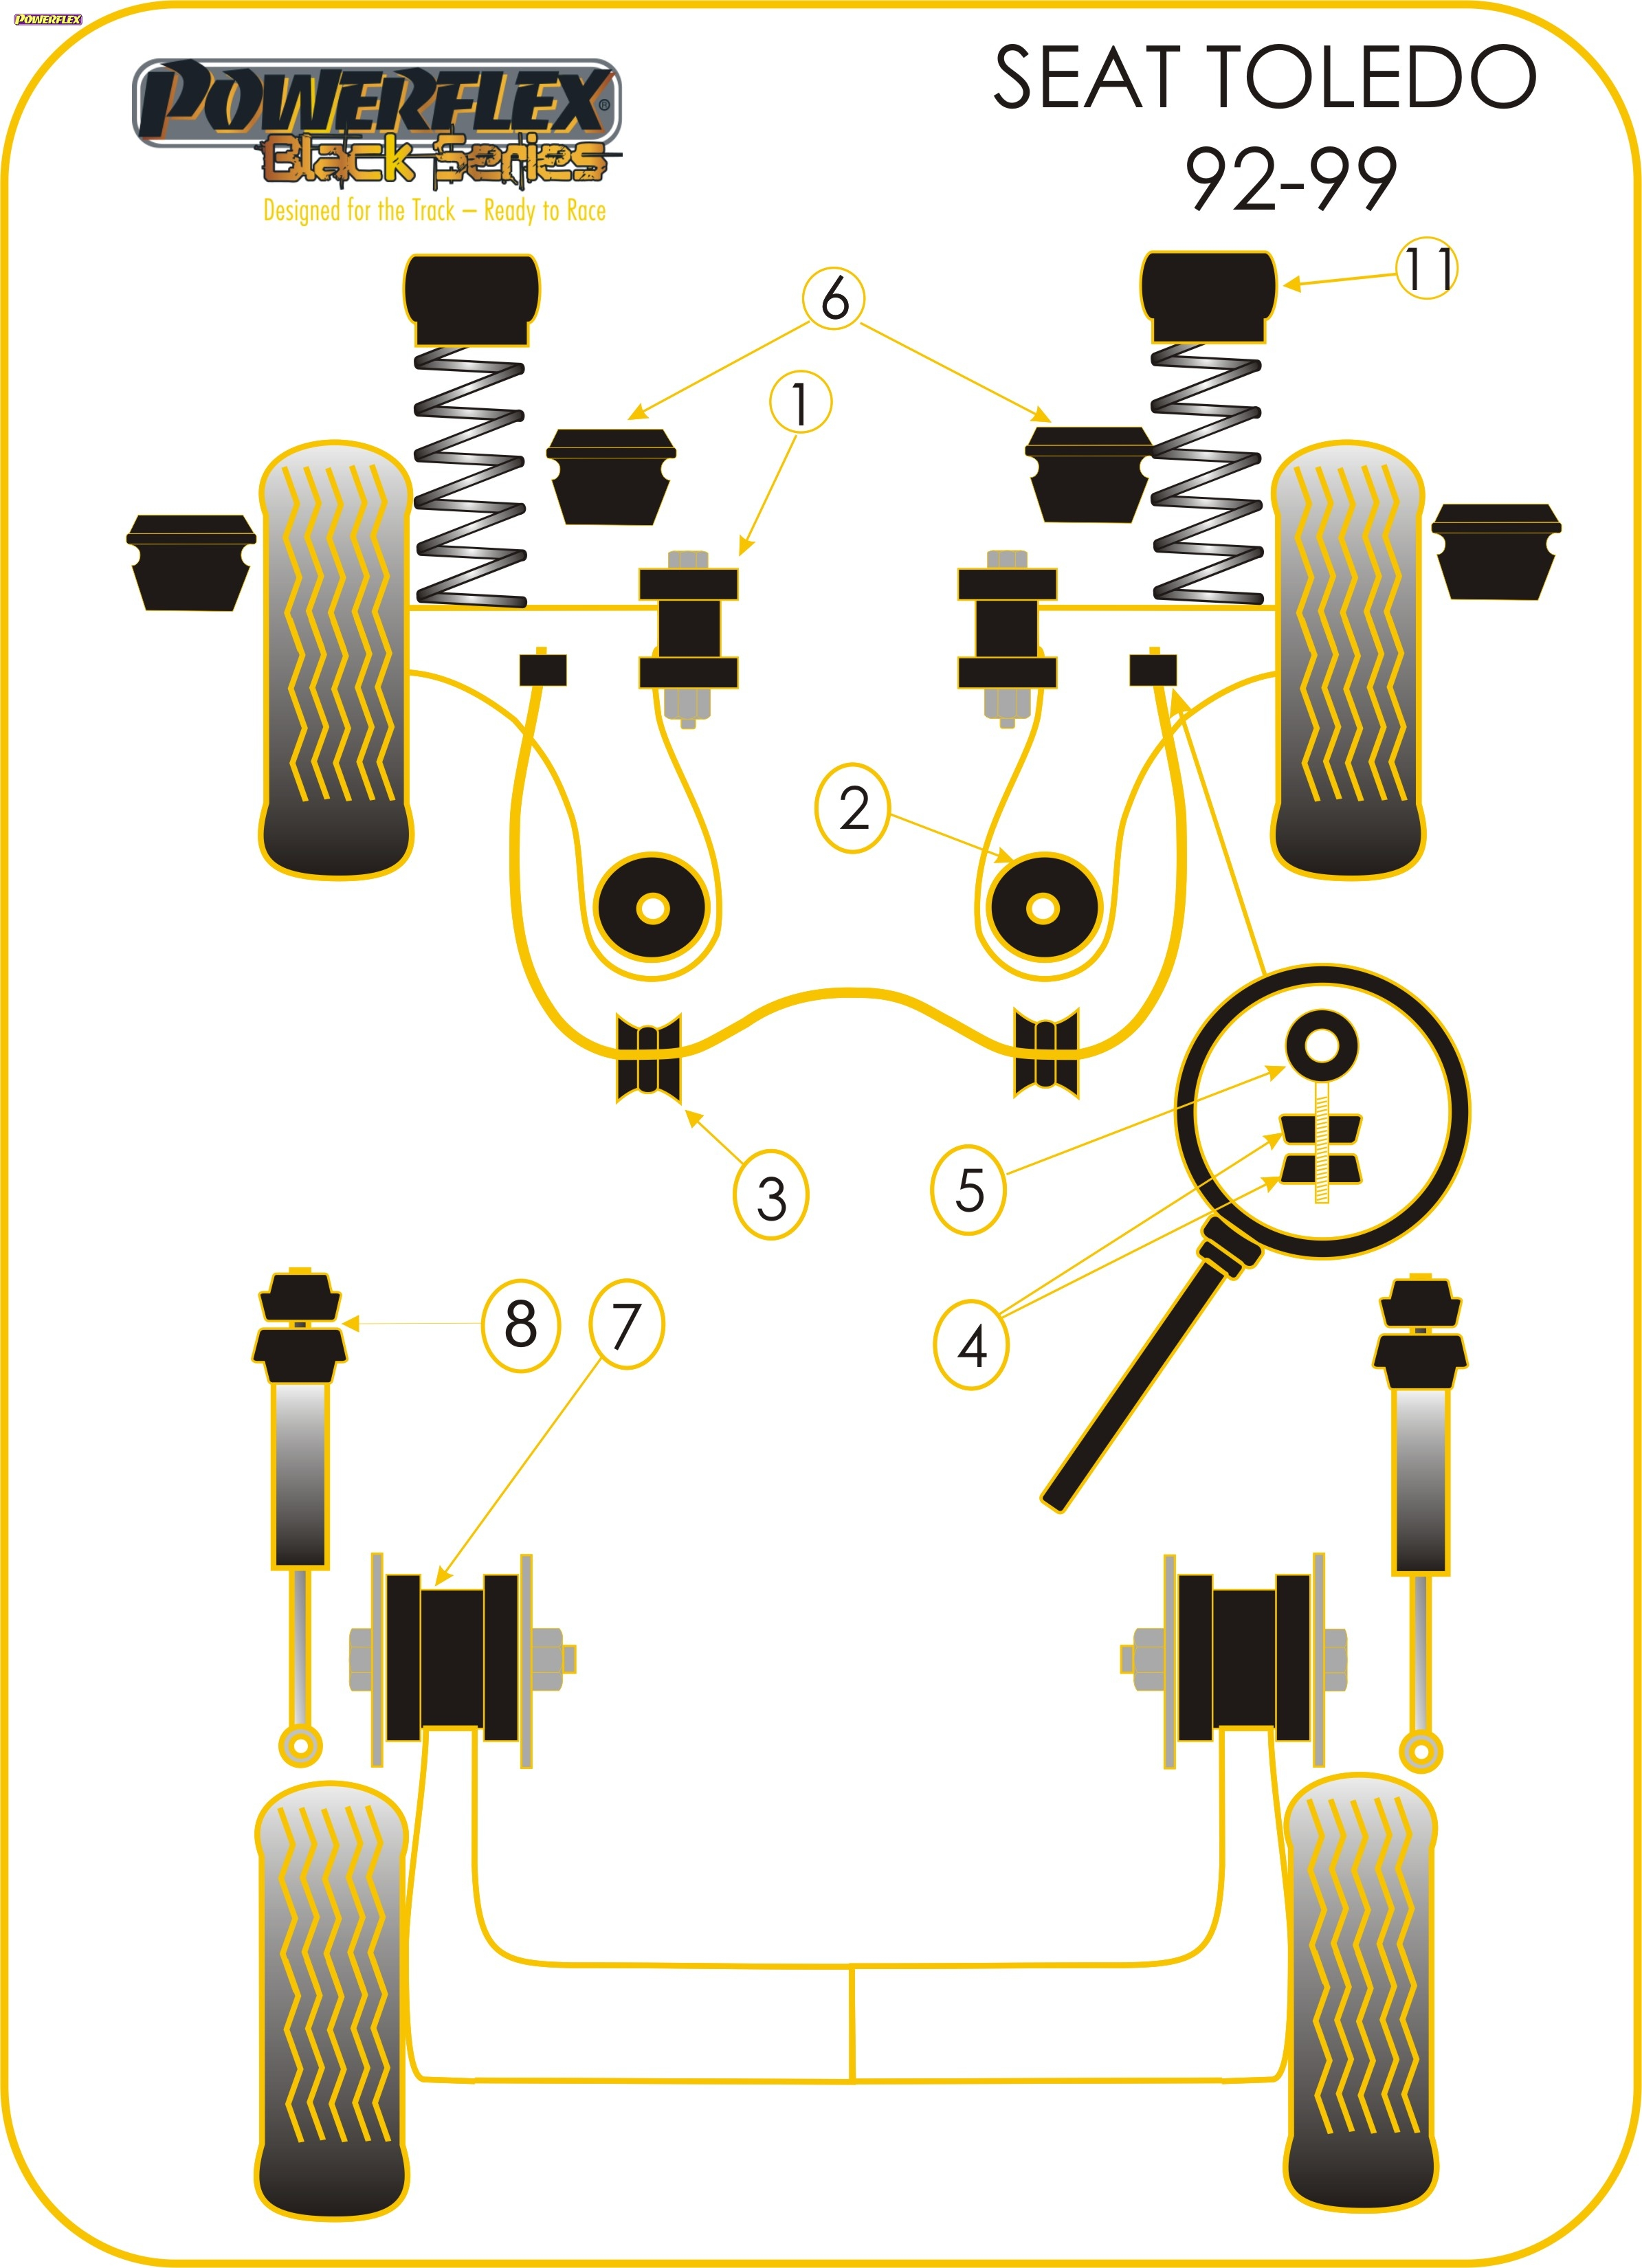 Powerflex-Cojinete-pff85-244blk-Trasero-Inferior-Buje-de-soporte-del-motor